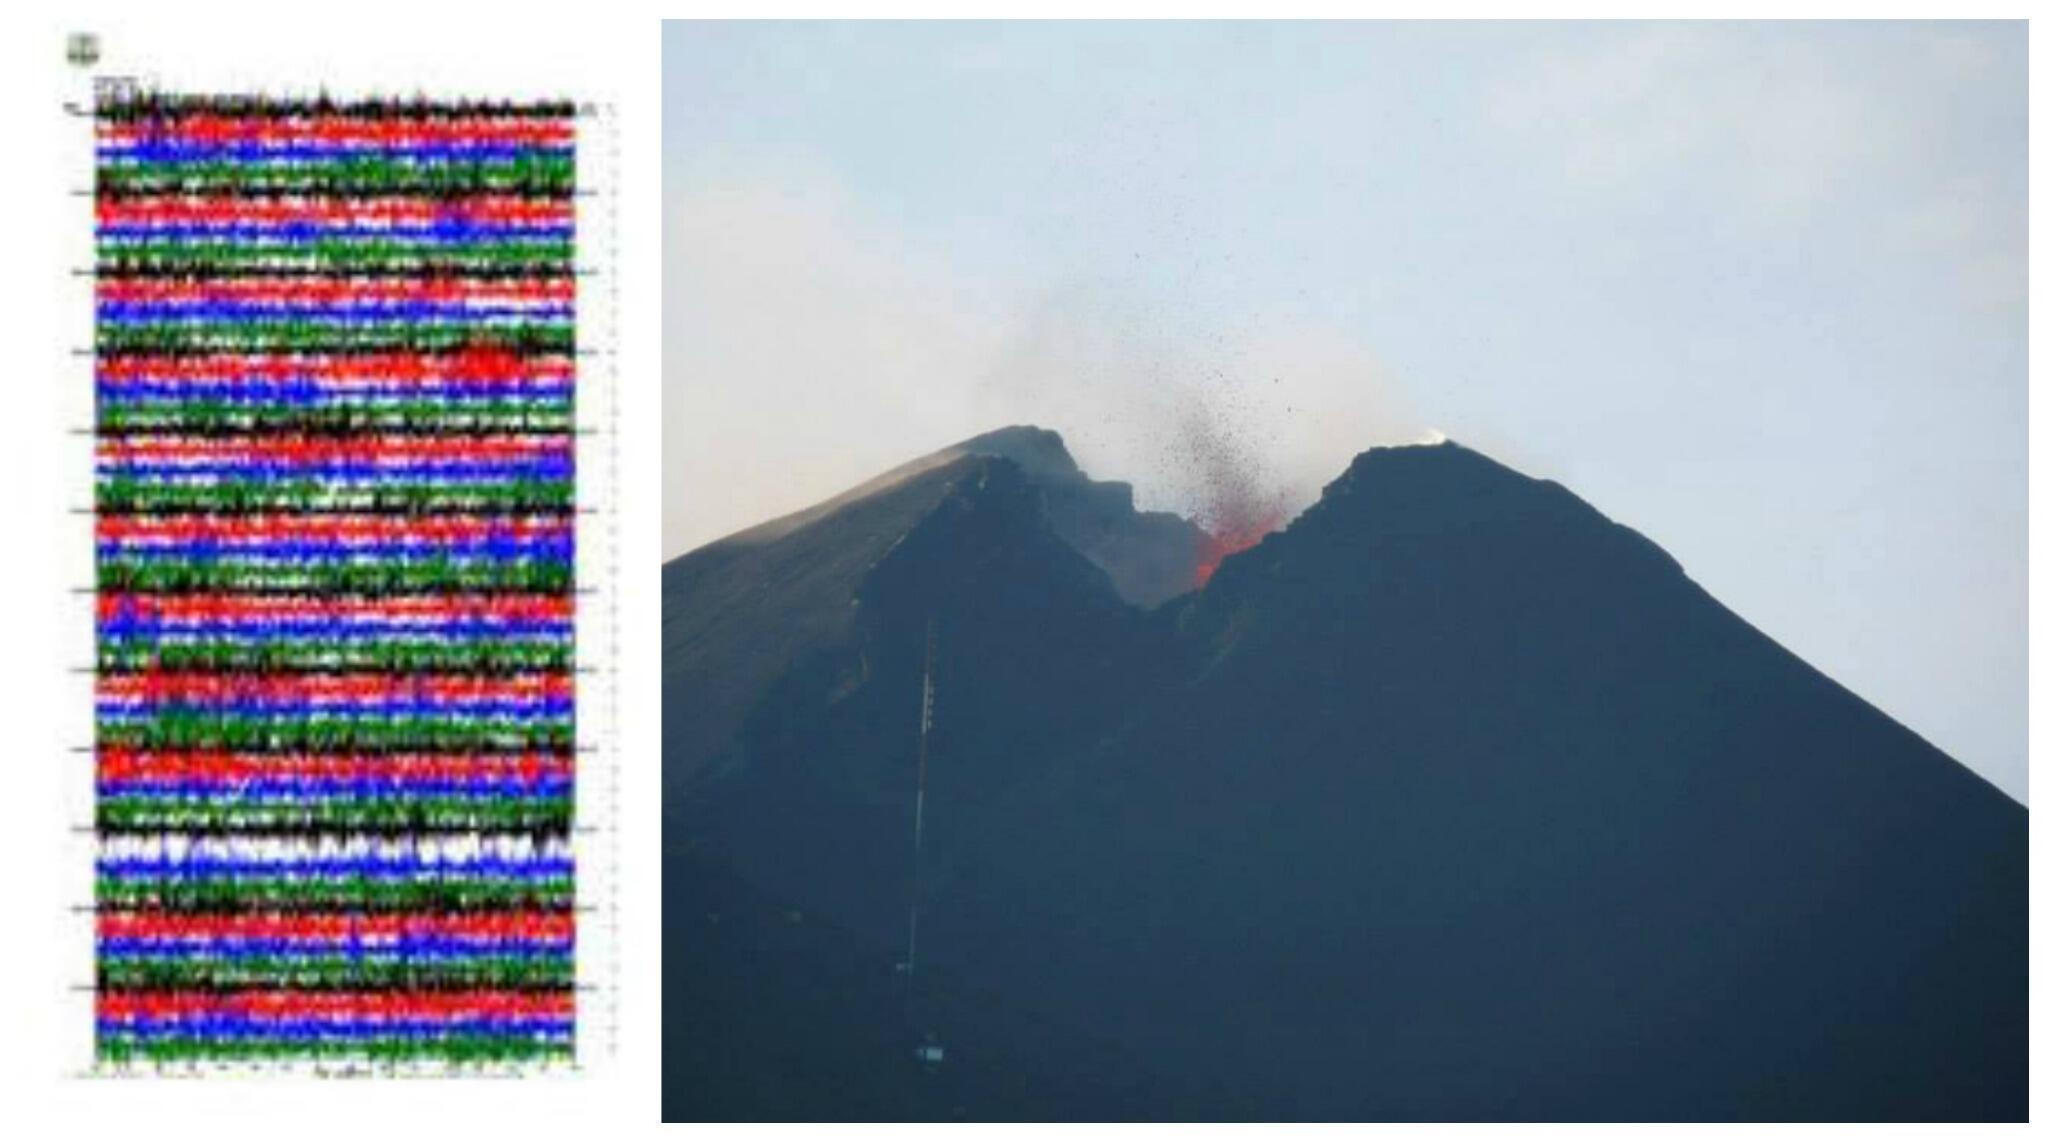 L'activité du volcan Pacaya, 26 août 2013